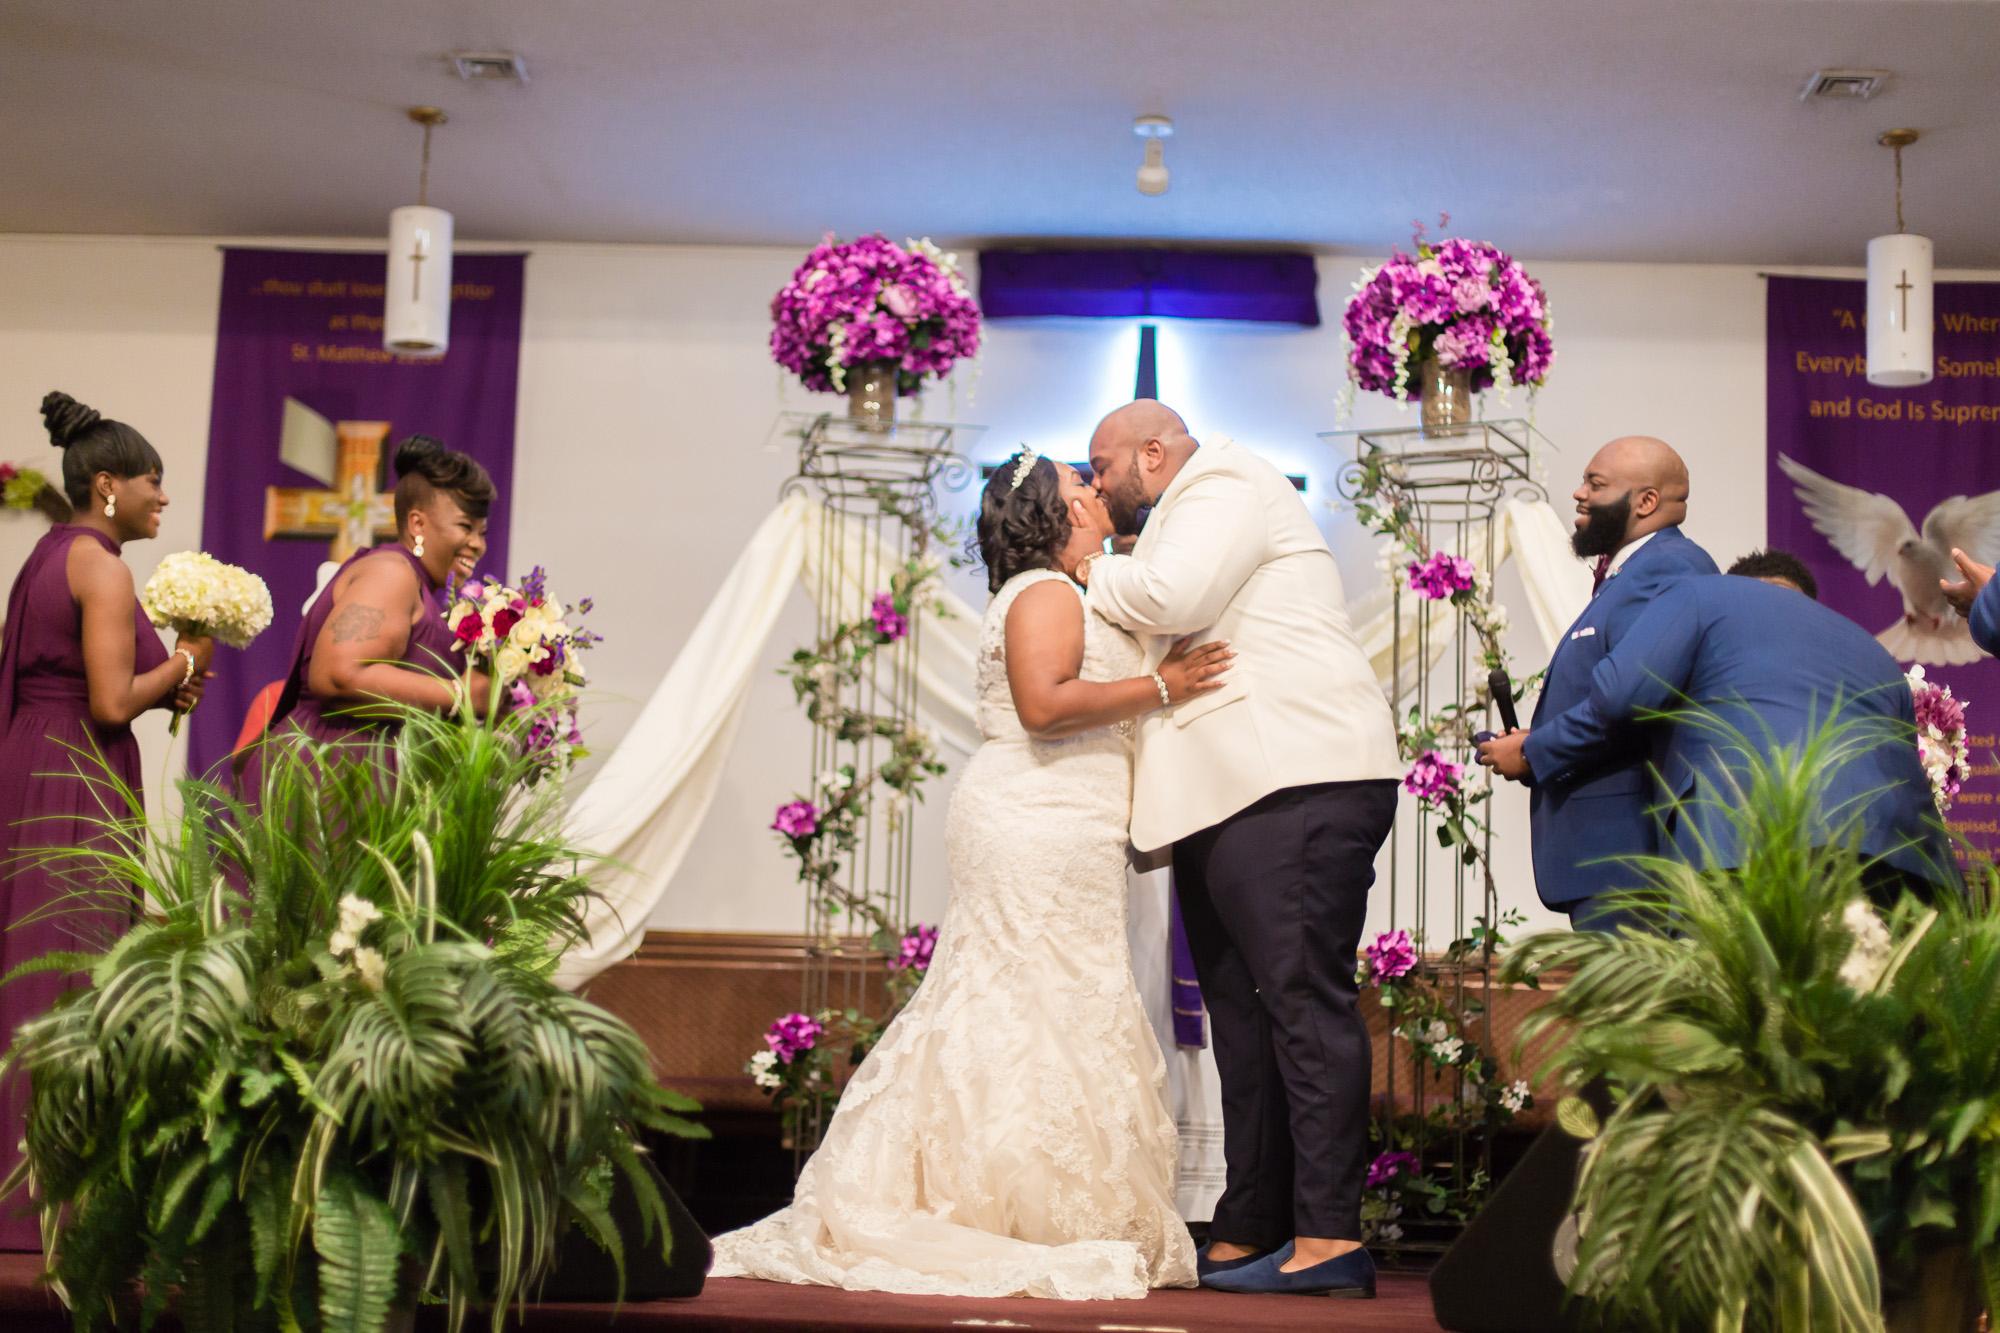 Kristin + Will   First Kiss   Mount Calvary Christian Center Wedding Ceremony  Greenville NC Wedding Photographer   Bryant Tyson Photography   www.memoriesbybryant.com